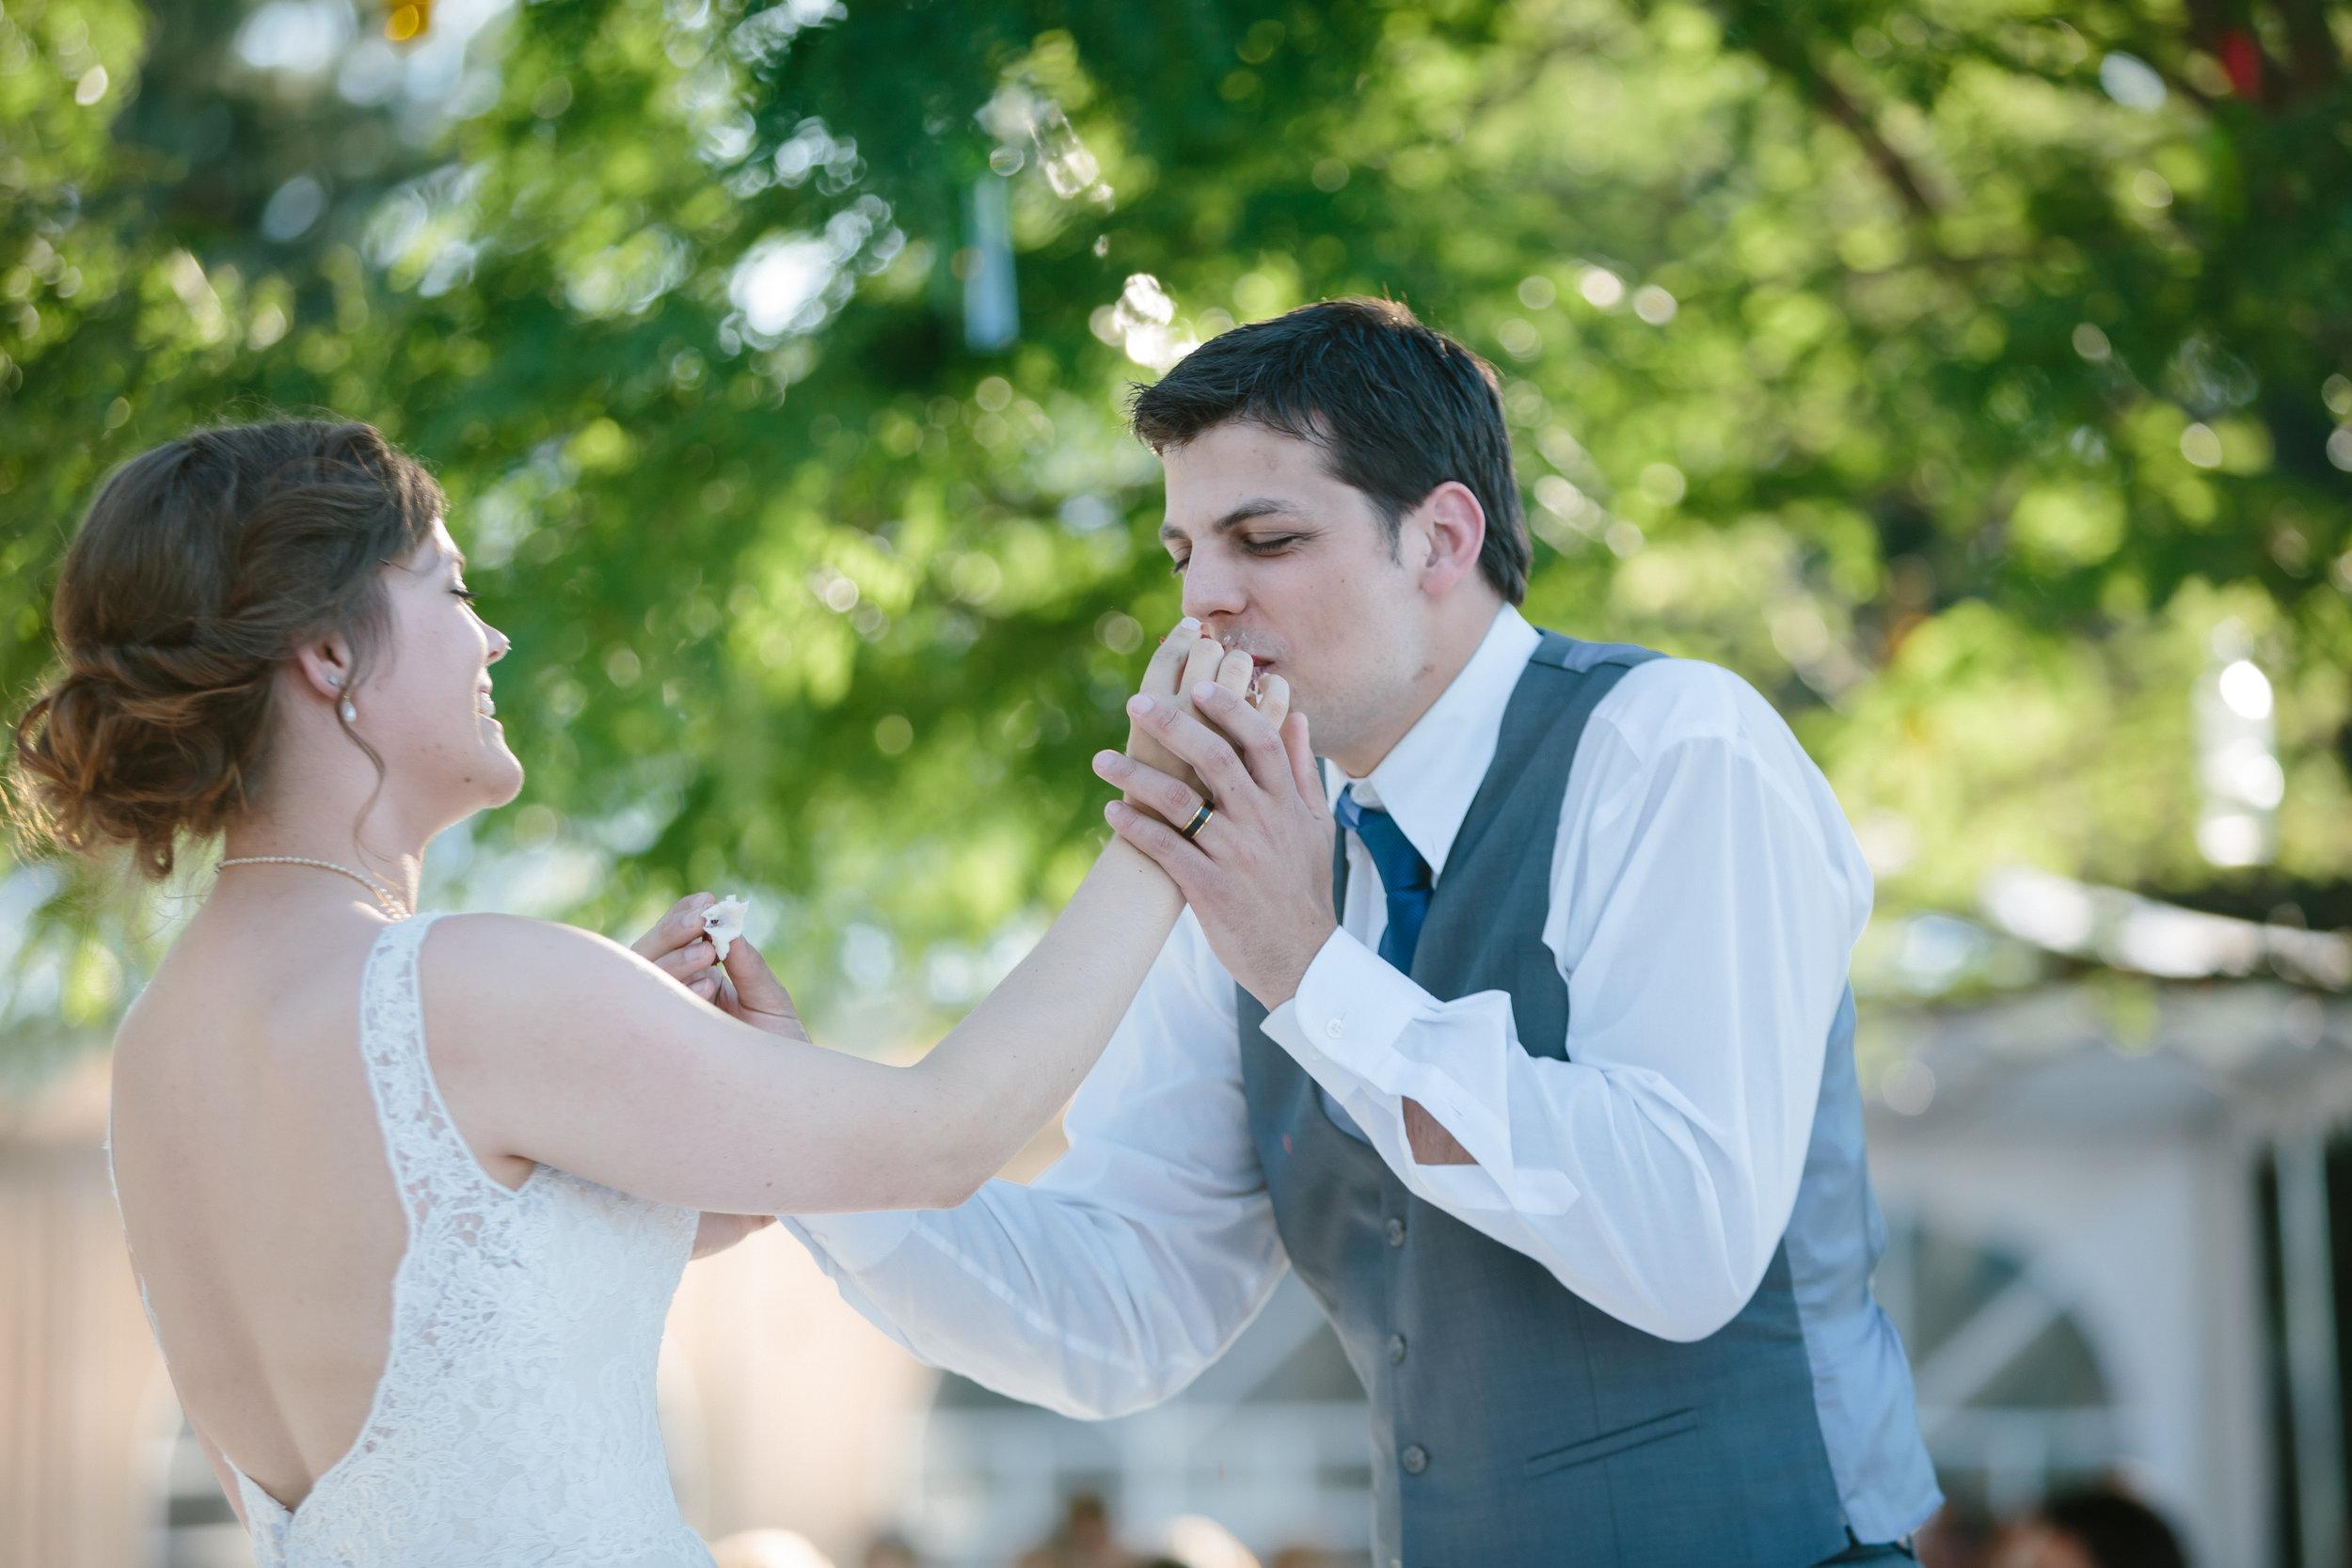 Jordan & Shantel Married - Idaho - Corrie Mick Photography-289.jpg